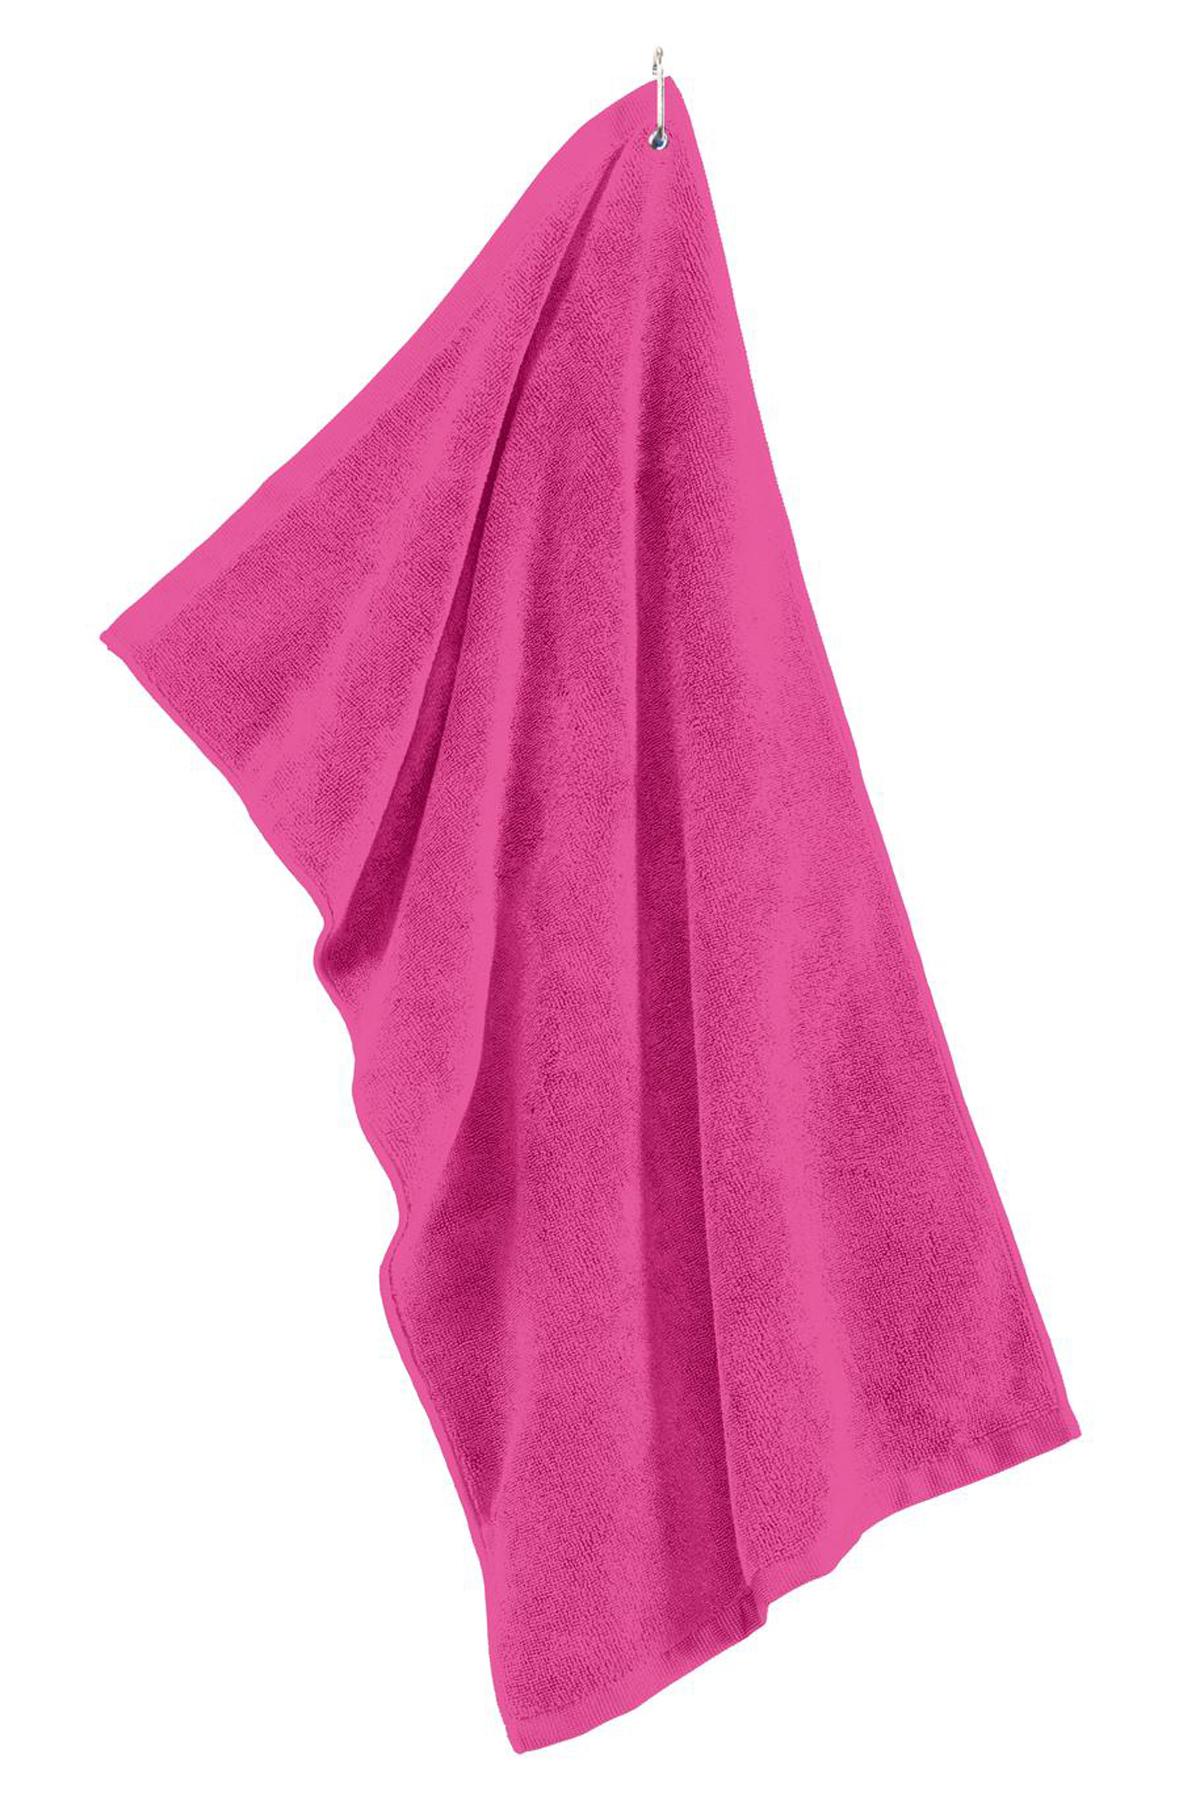 Accessories-Golf-Towels-8